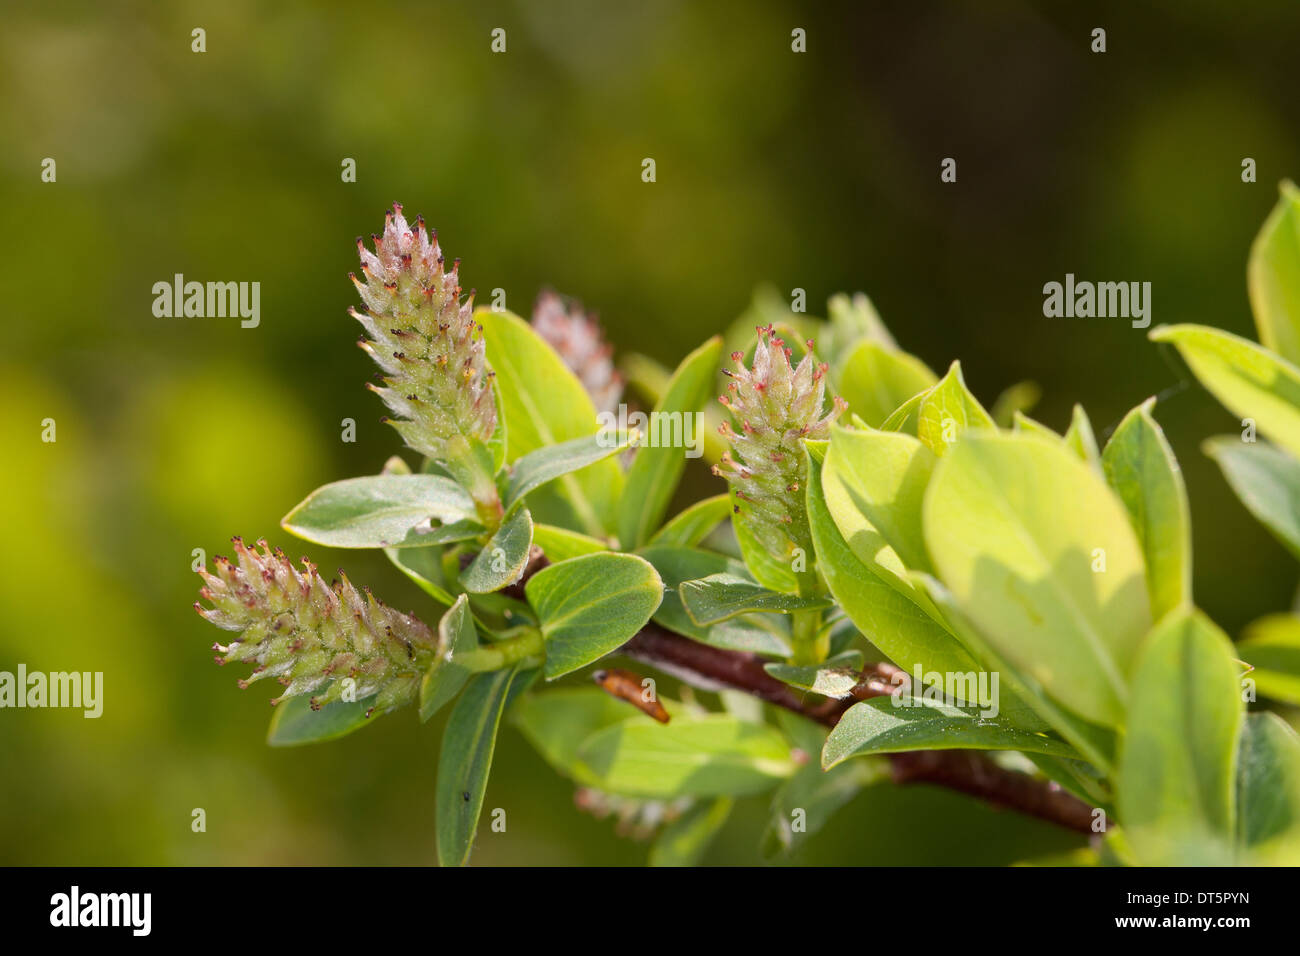 Blue willow, Blue Leaved Willow, Blaugrüne Weide, Hechtblaue Weide, Salix caesia Stock Photo